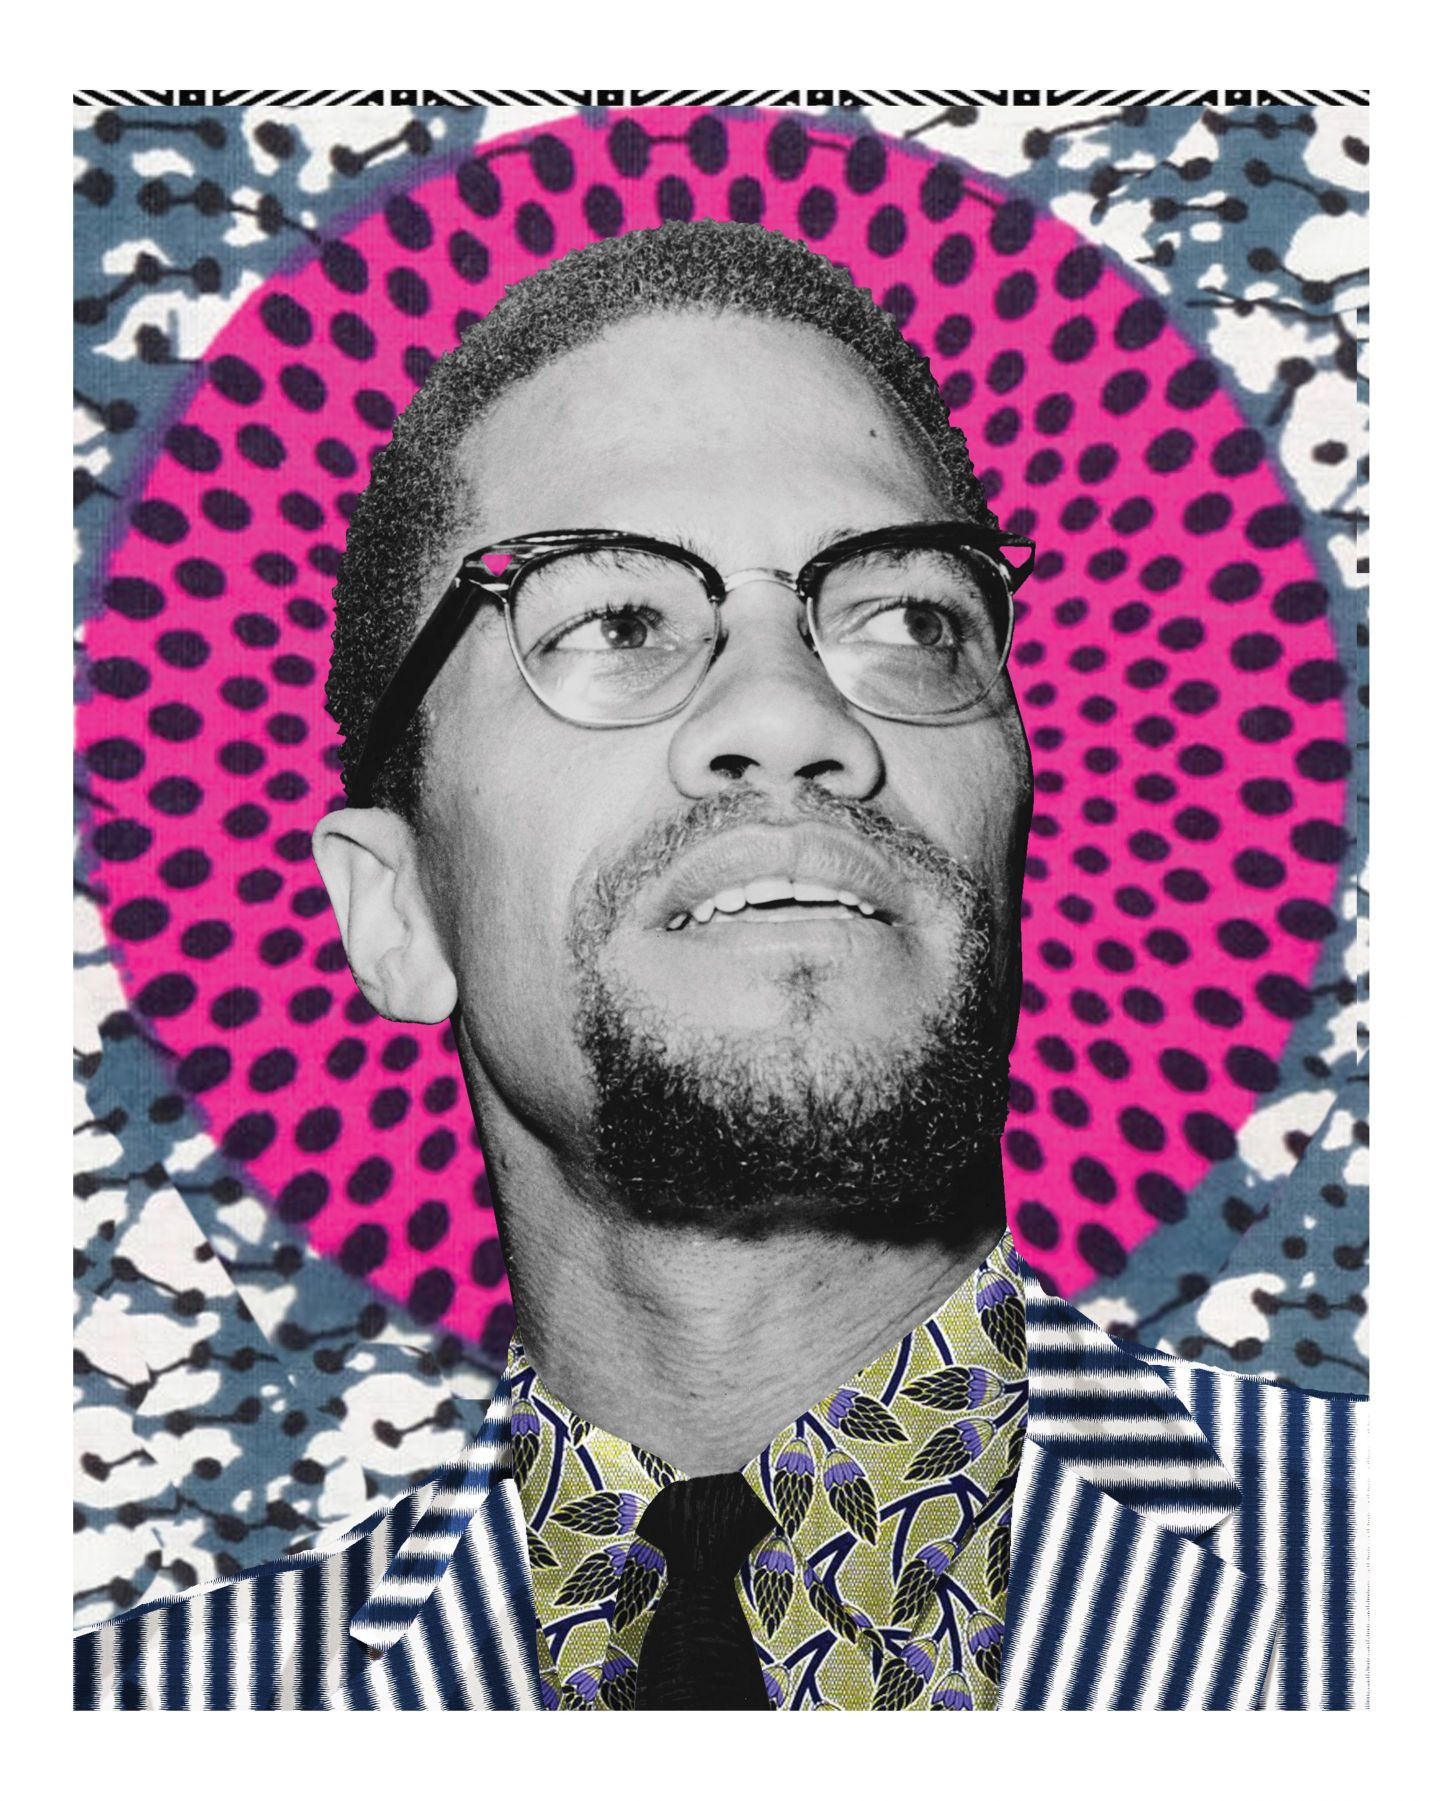 Original-El-Hajj-Malik-El-Shabazz-Malcolm-X-by-Makeba-KEEBS-Rainey_noframe-1440x1801 Makeeba KEEBS Rainey Art Featured in Absolut Art